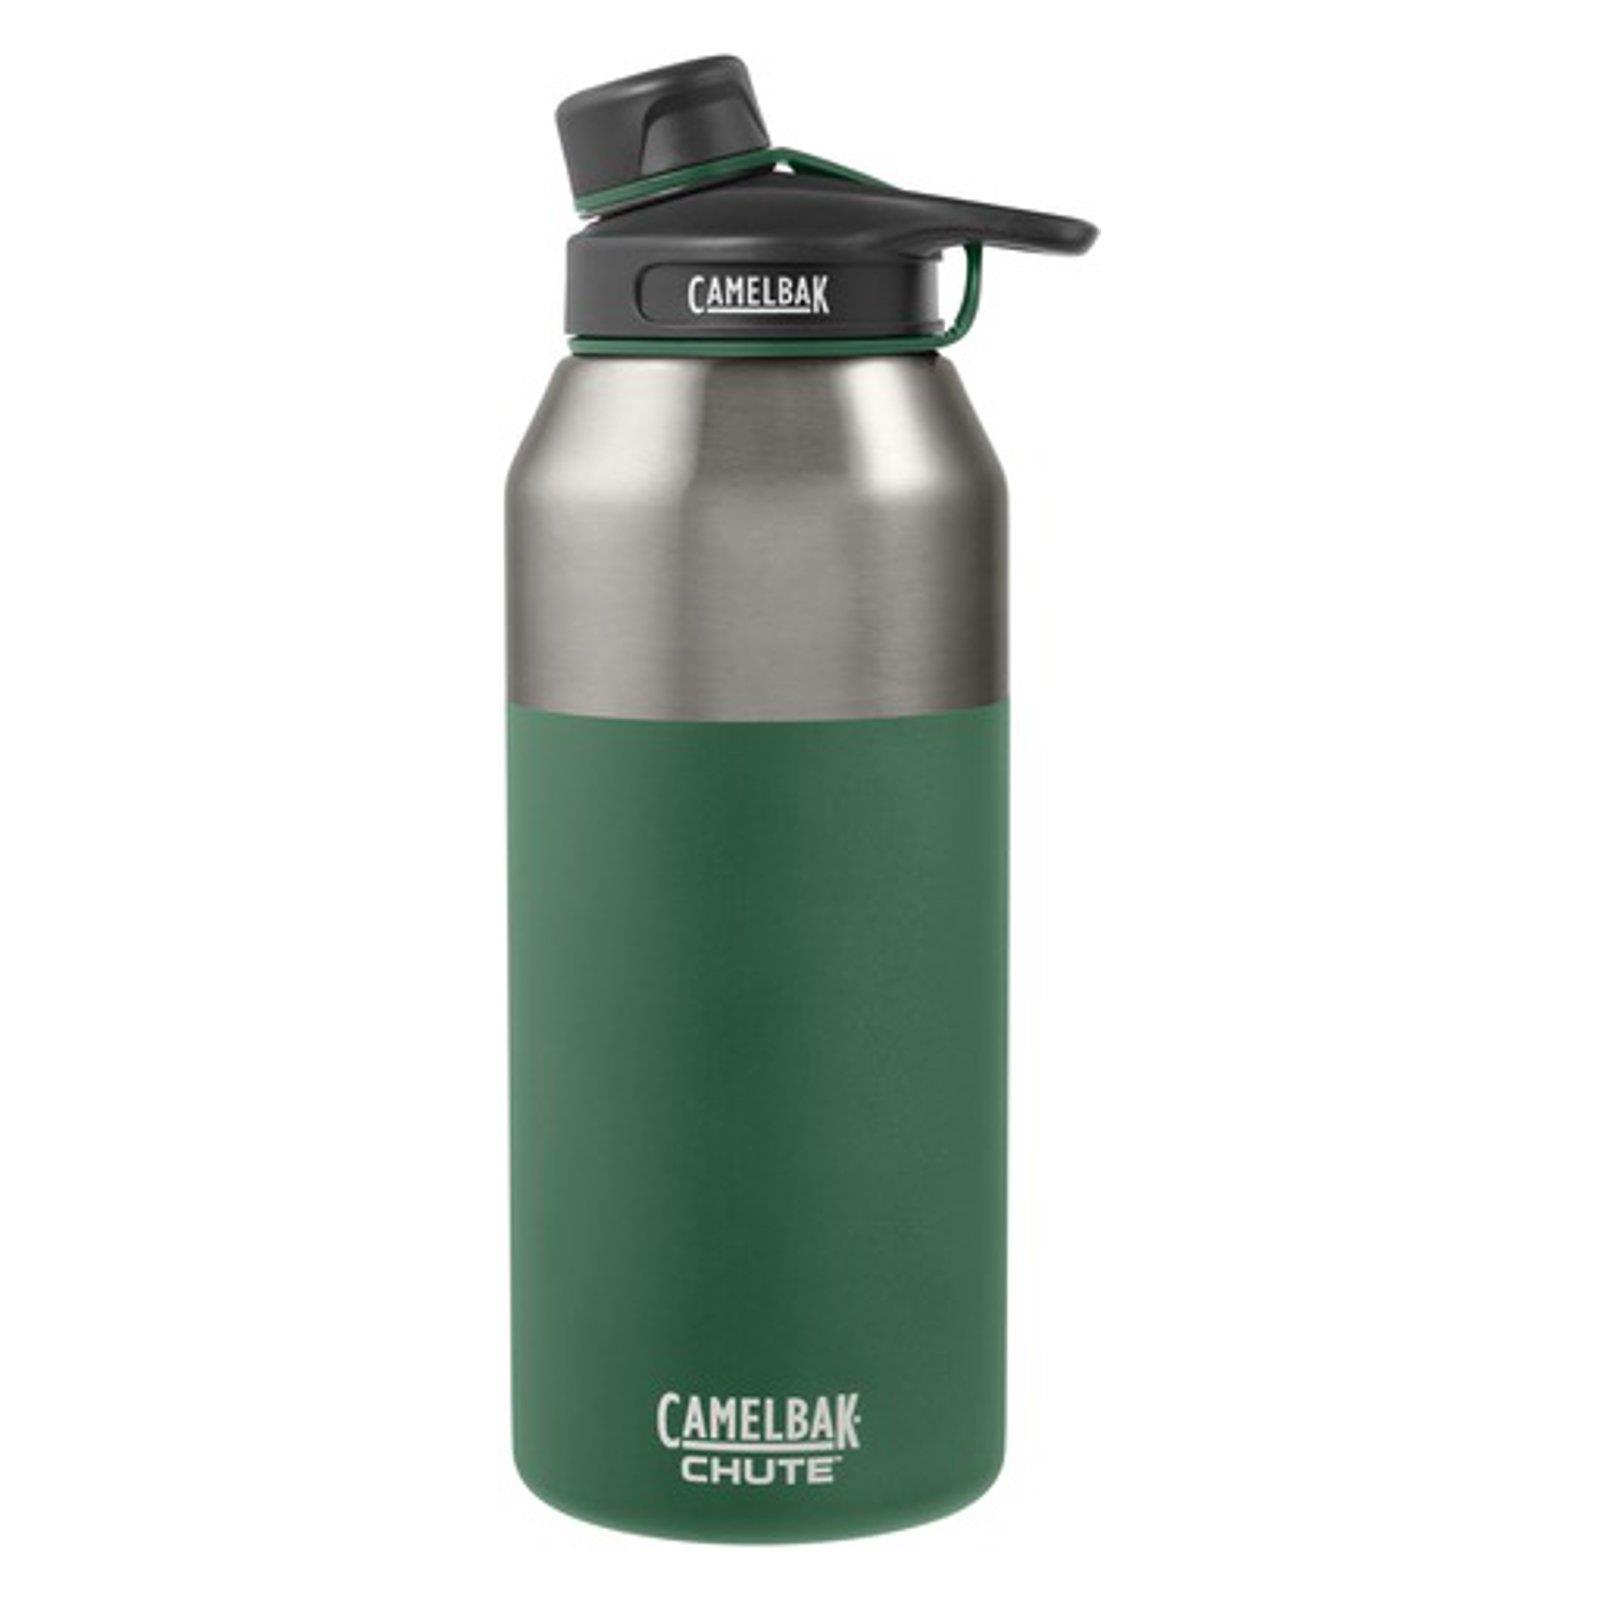 Camelbak-Trink-Isolier-Flasche-Chute-Vacuum-Thermo-Becher-Kanne-Outdoor Indexbild 21